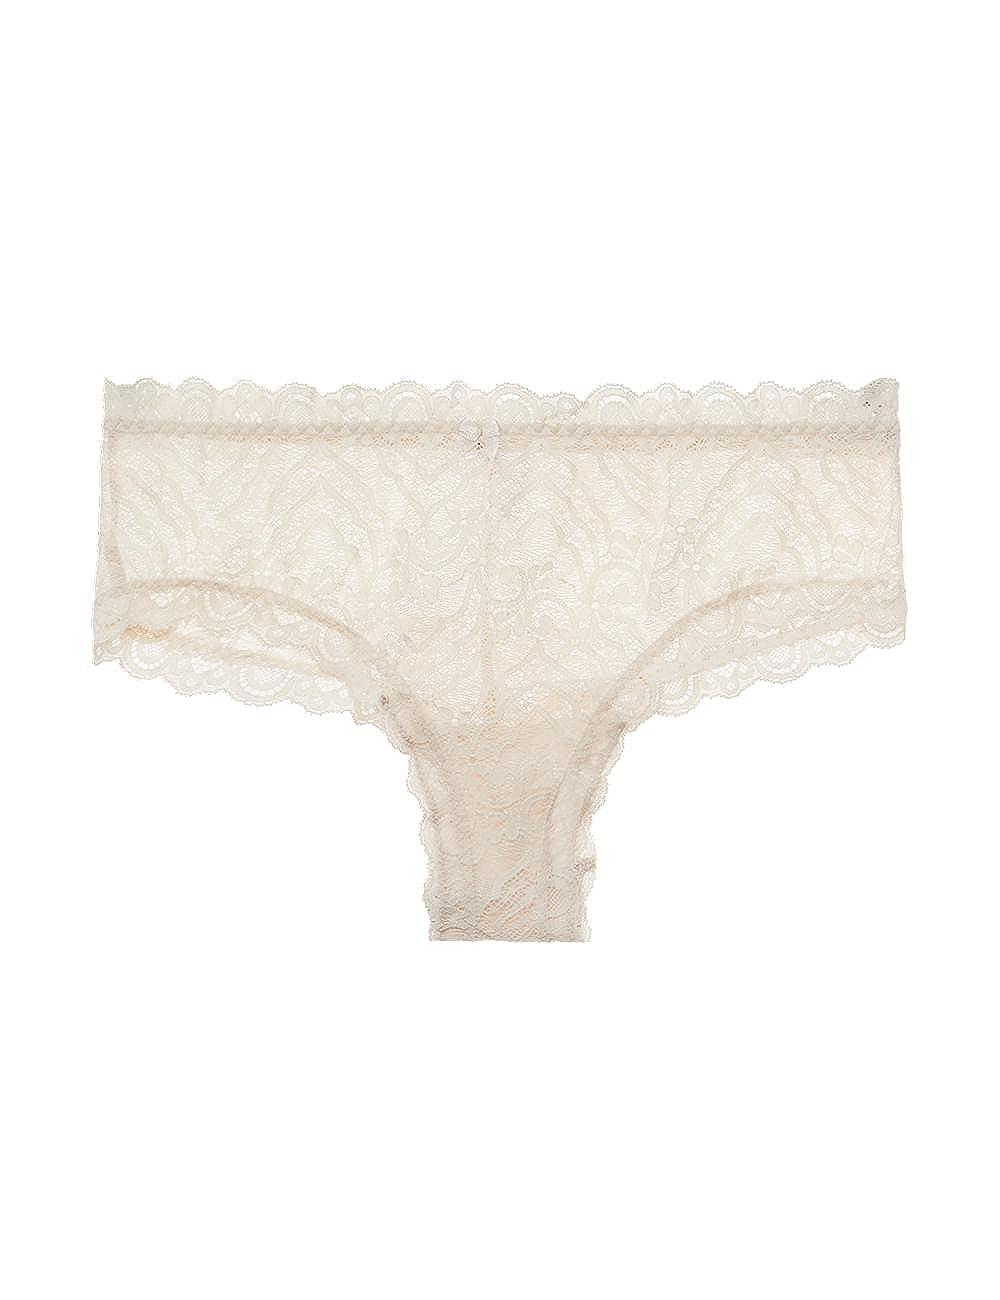 d06d6e2fd671 Intimissimi Womens Brazilian-Style Lace Culotte: Amazon.co.uk: Clothing